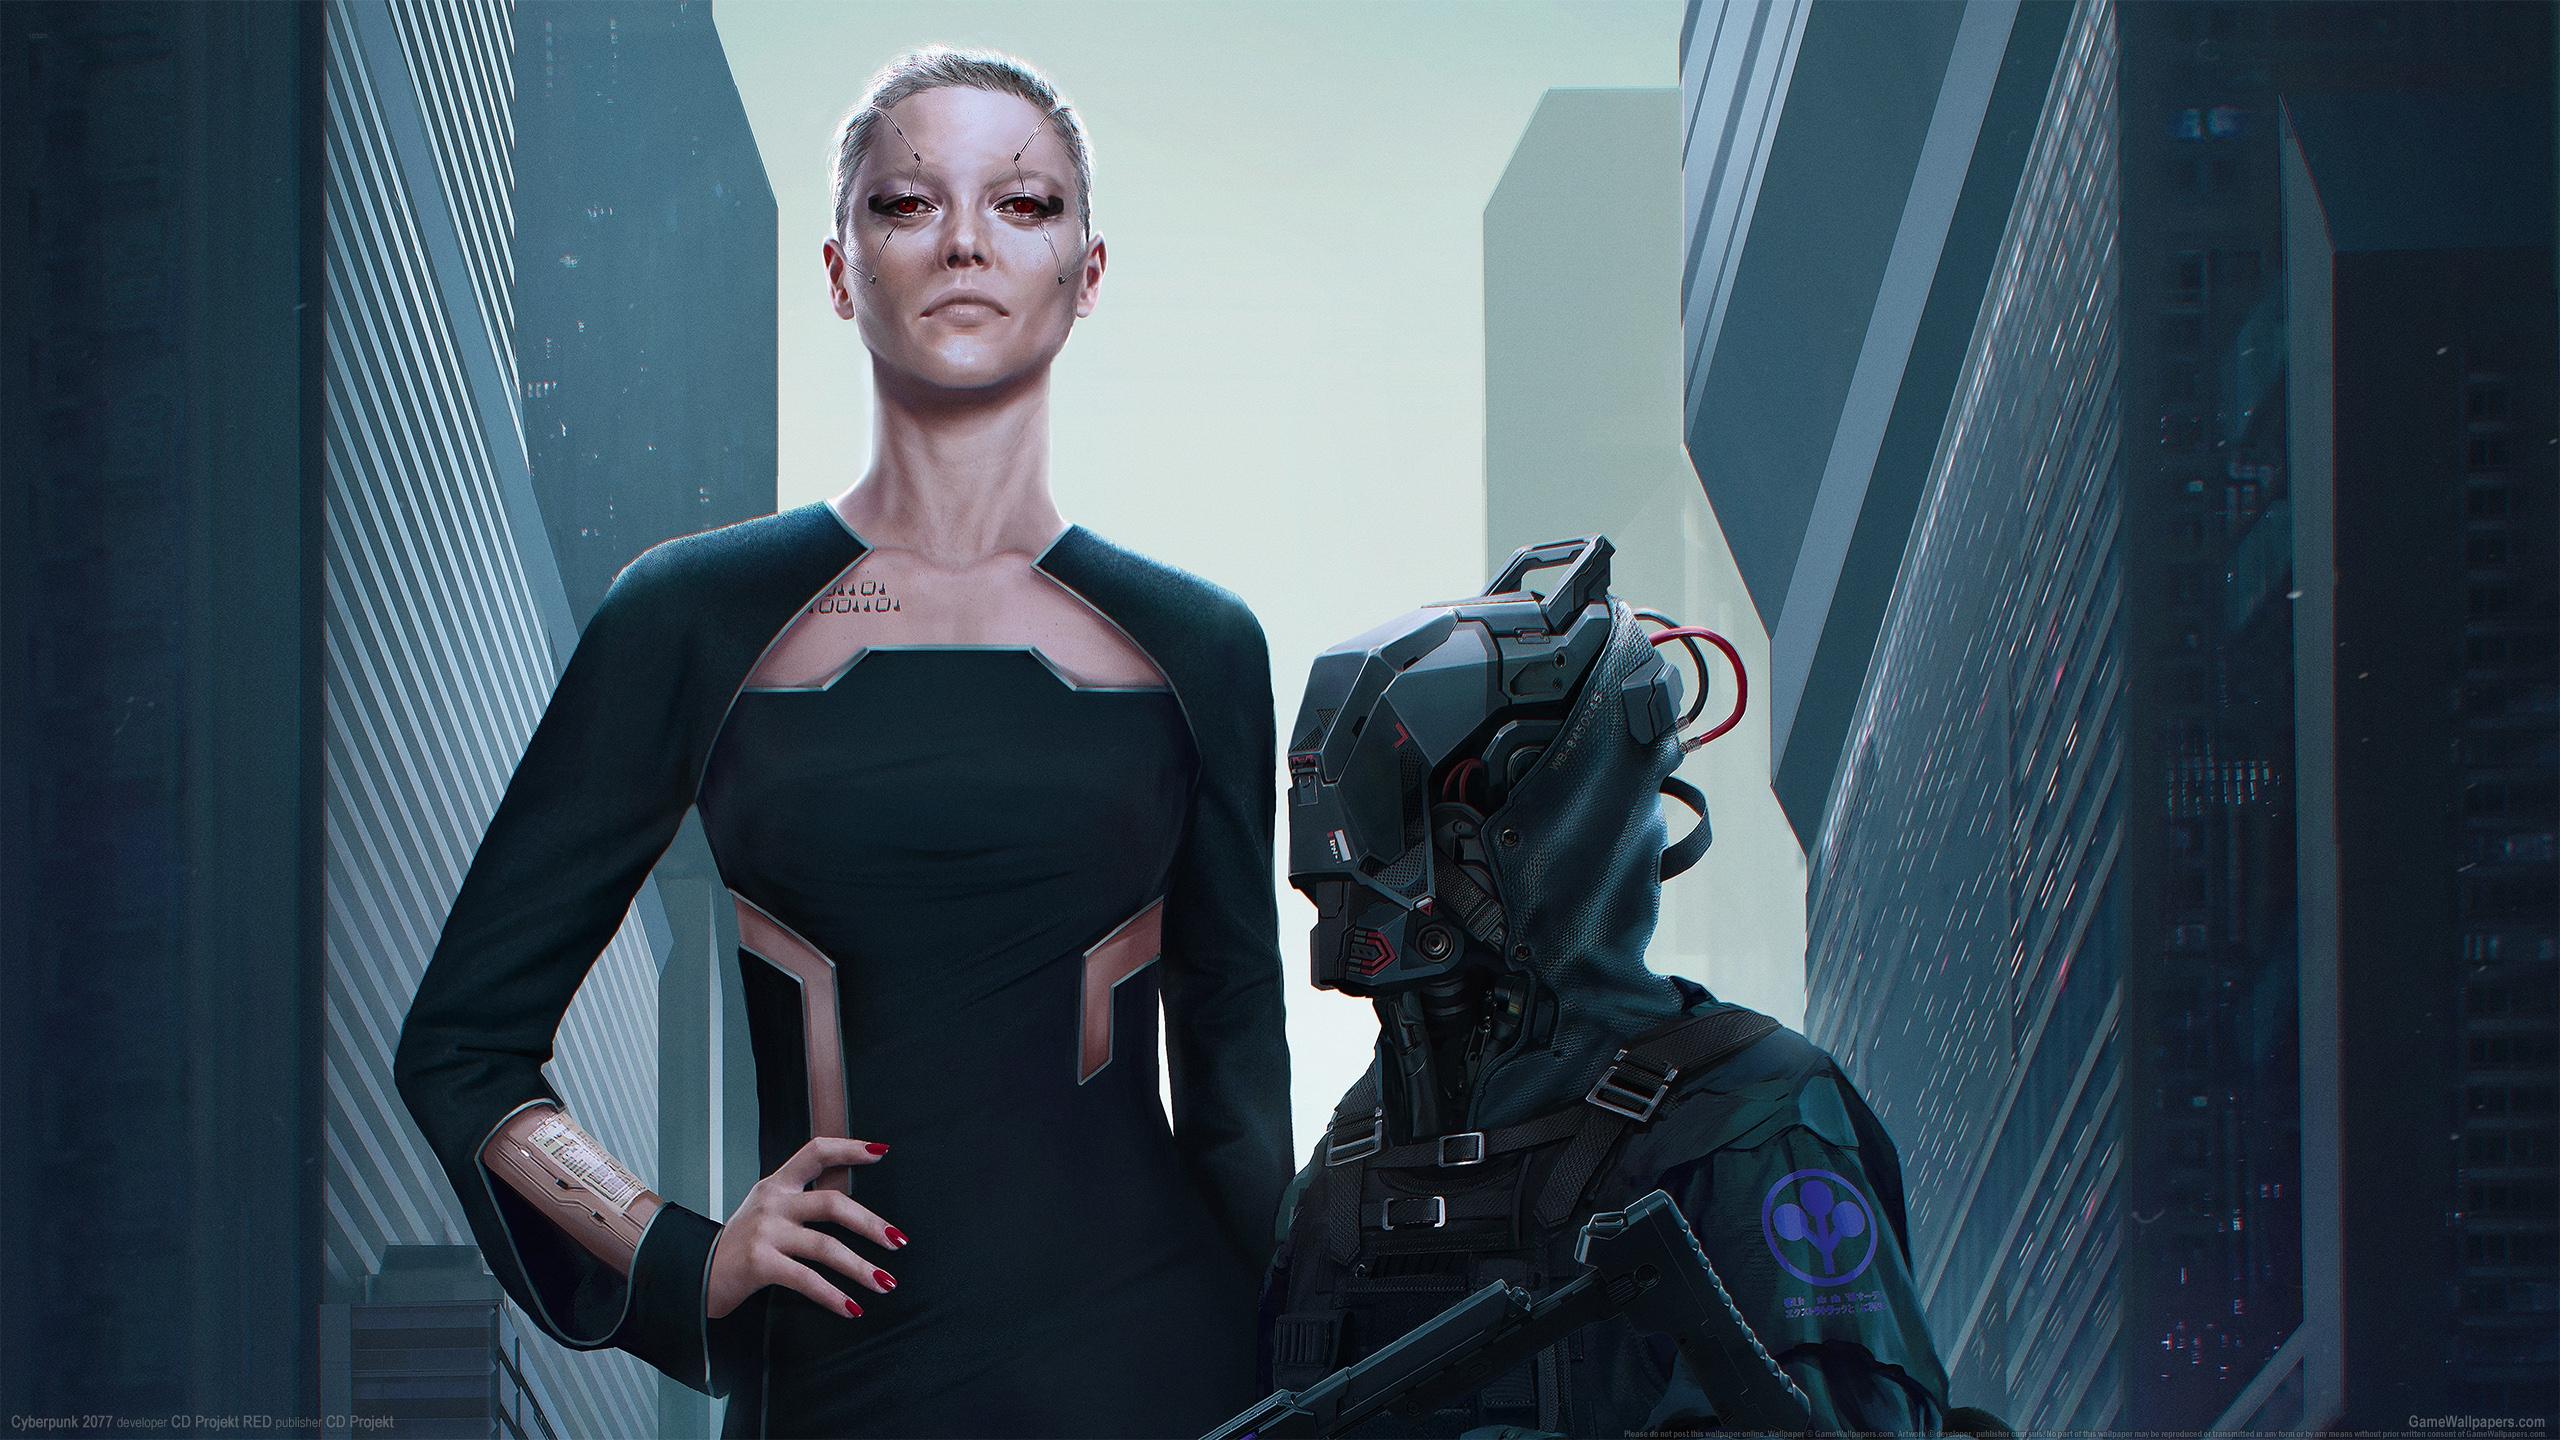 Cyberpunk 2077 2560x1440 Hintergrundbild 22